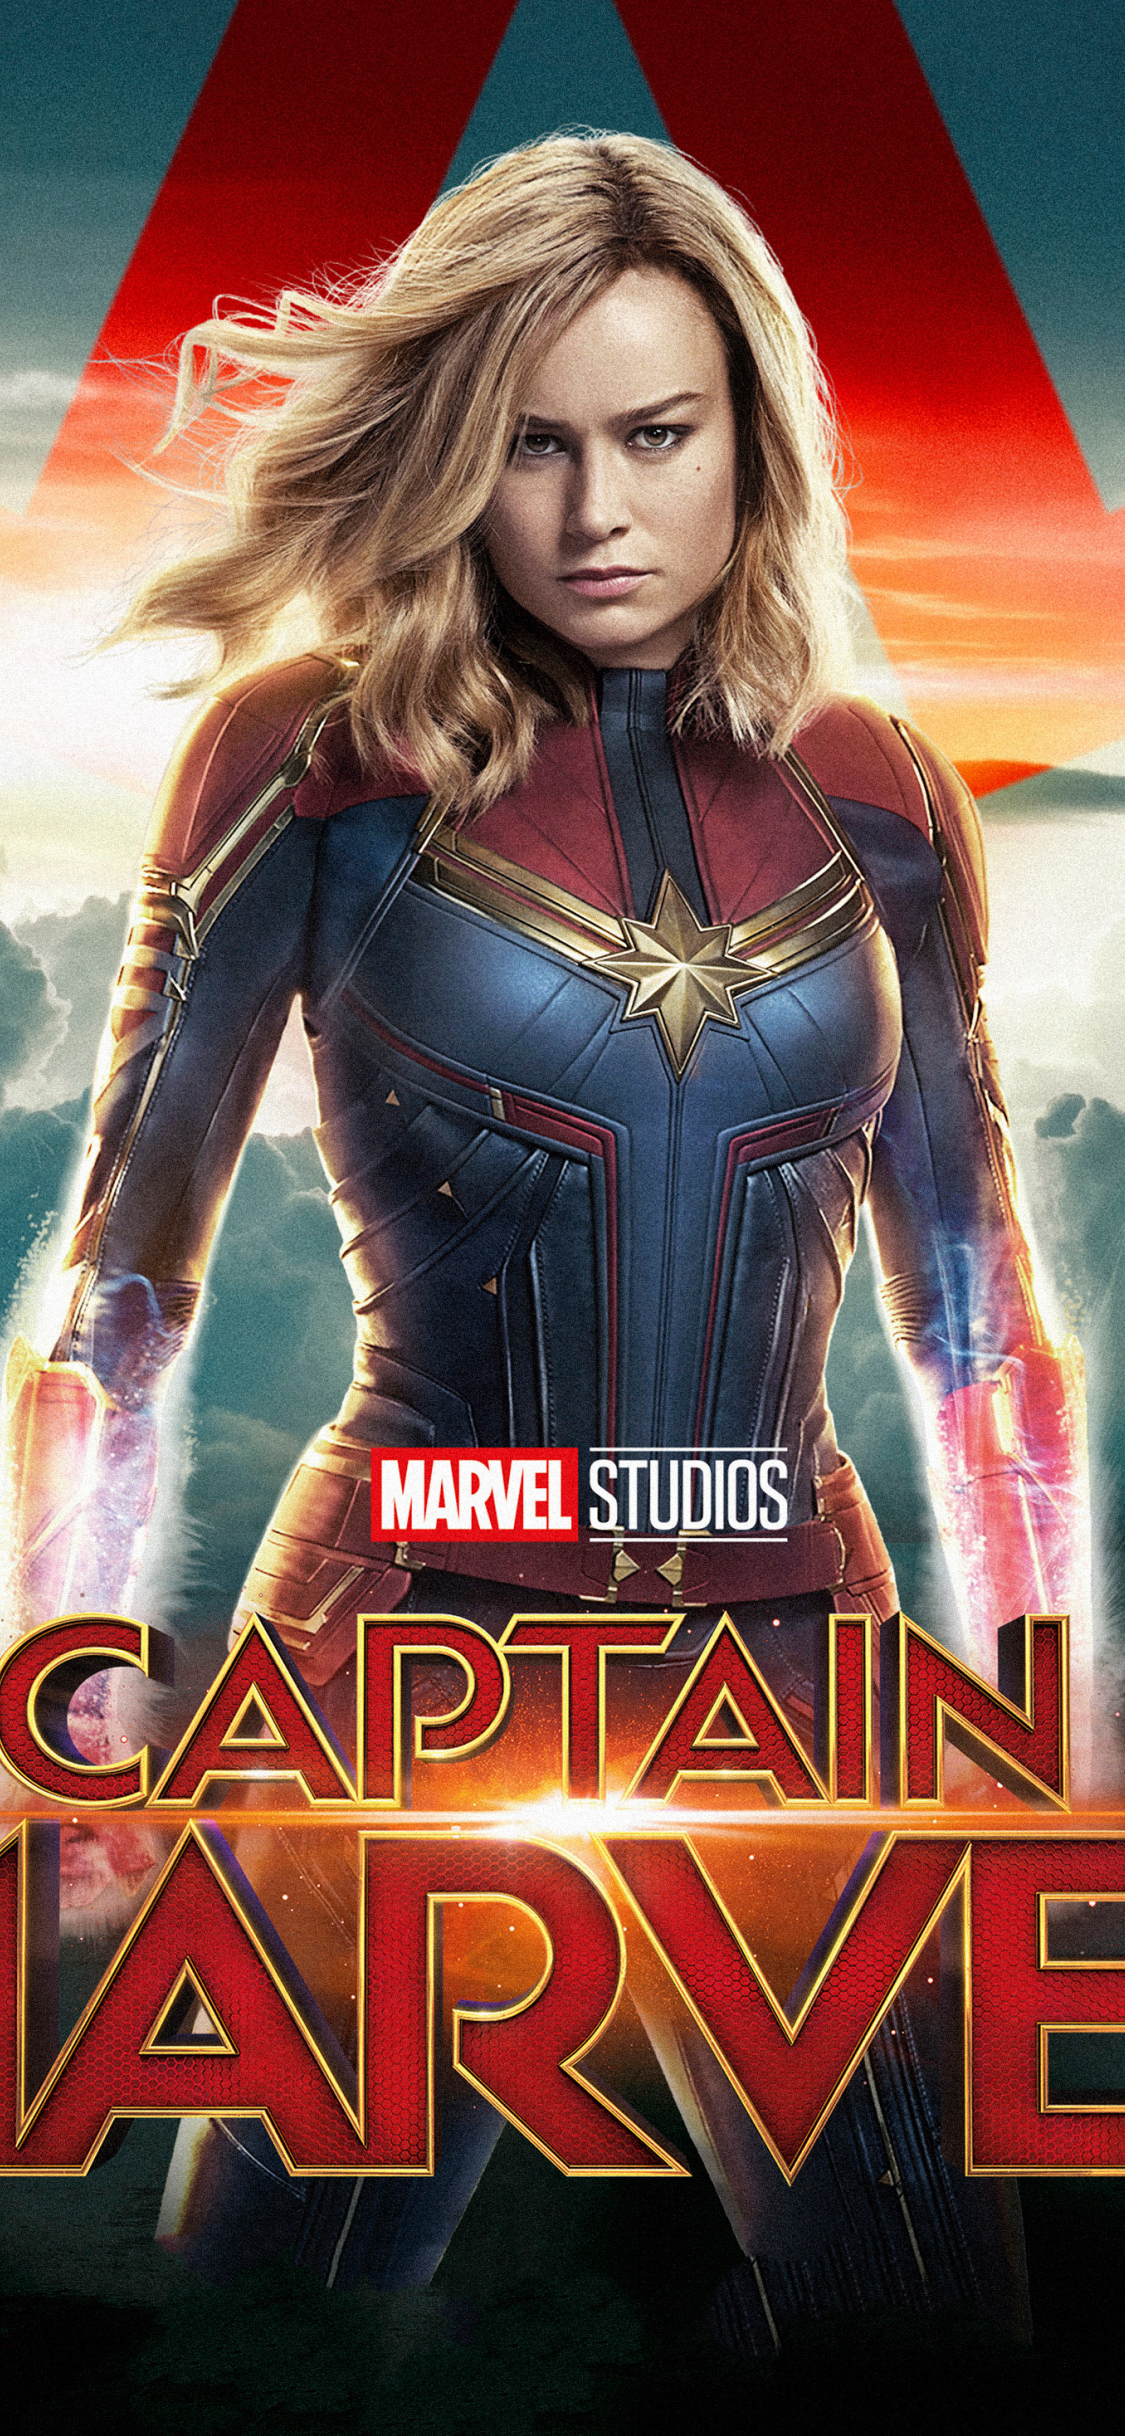 Download 1125x2436 Wallpaper Movie Superhero Actress Captain